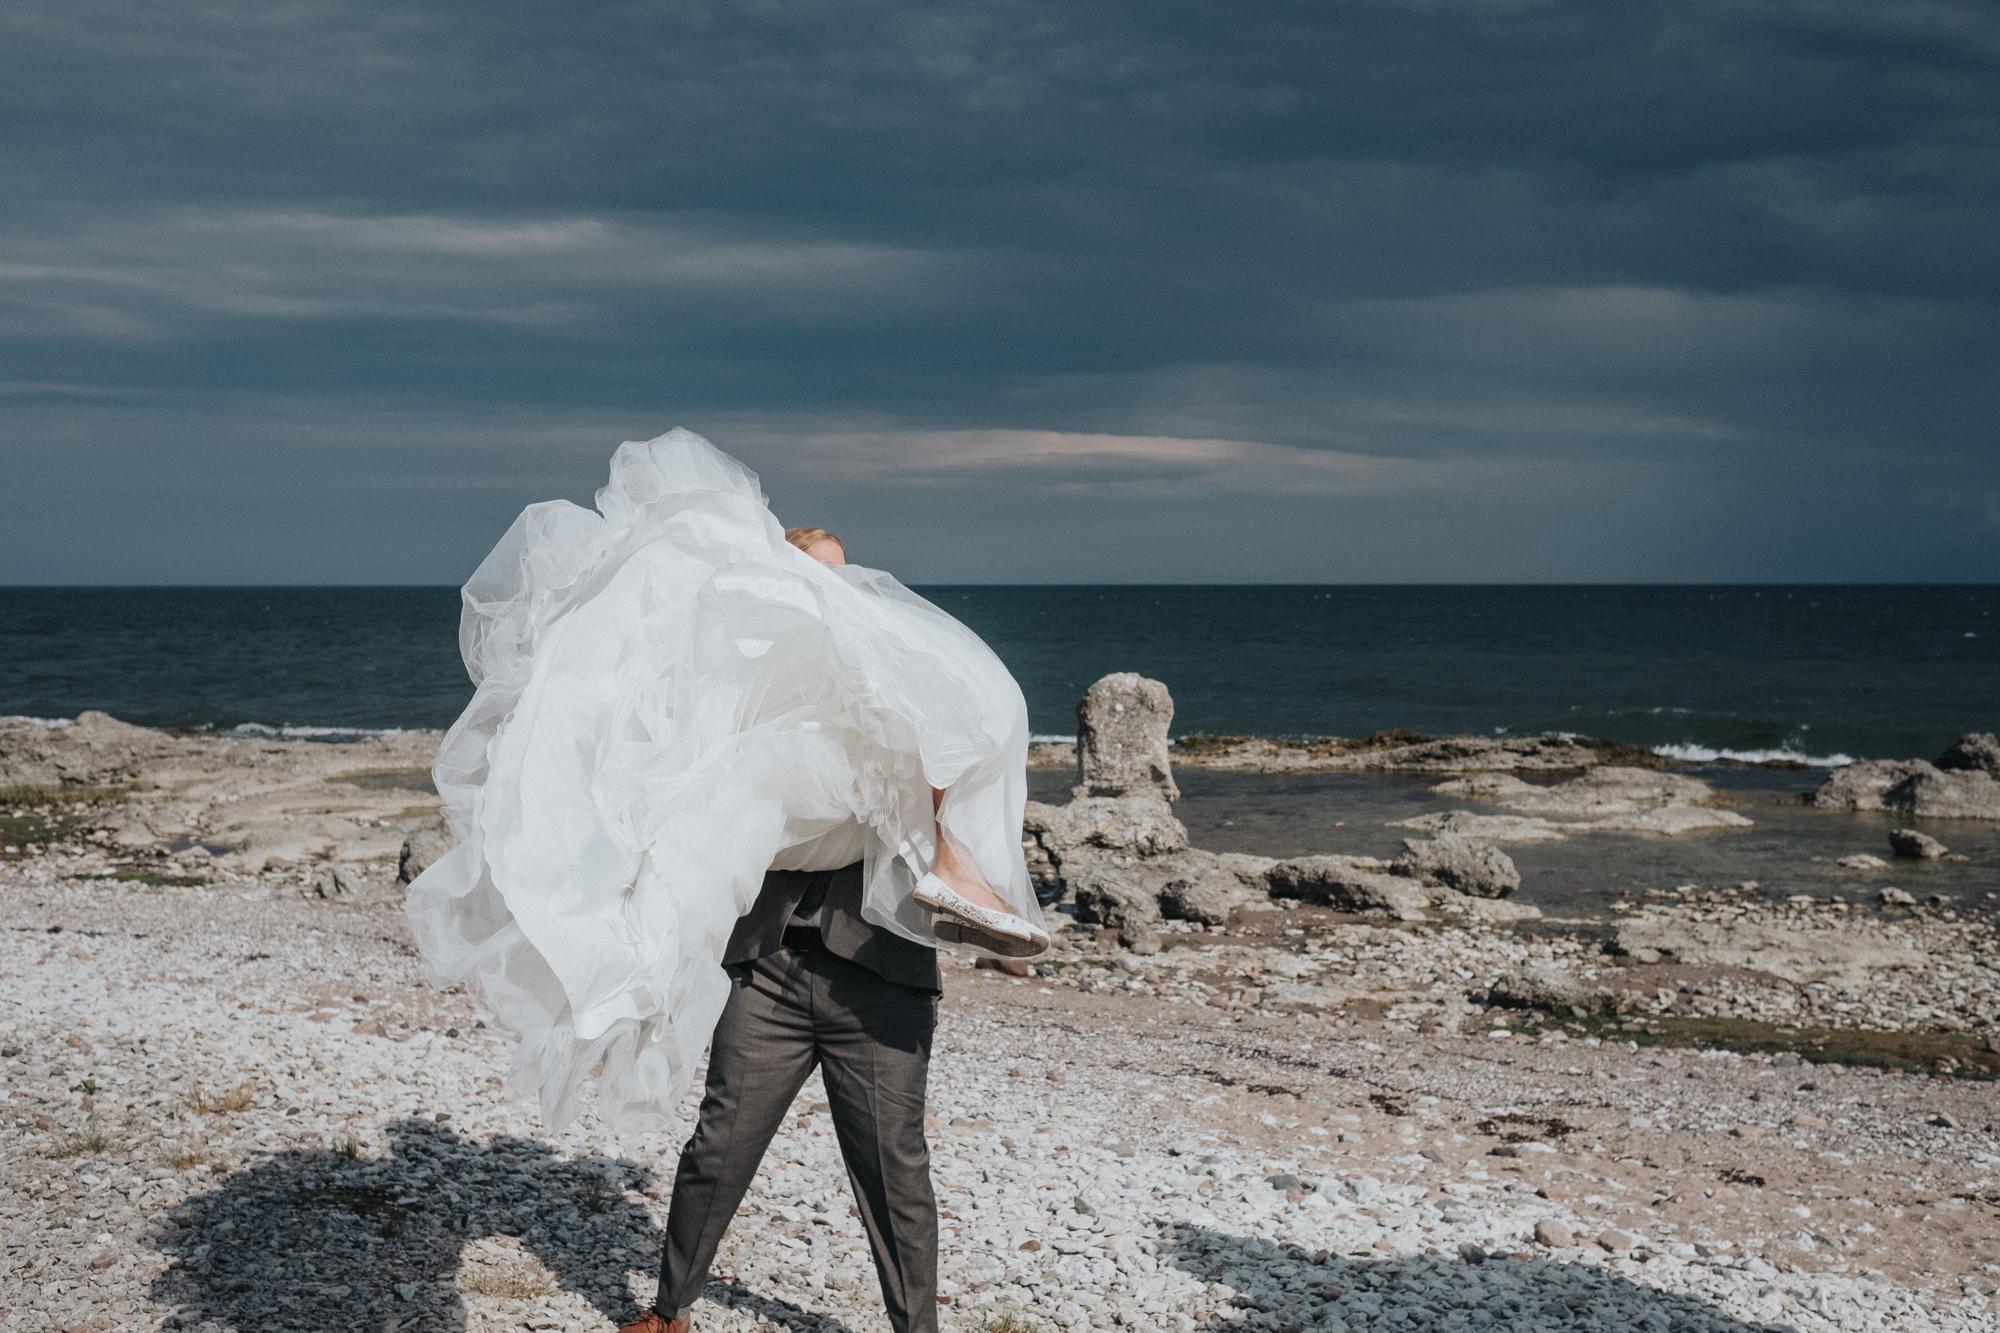 018-bröllopsfotograf-folhammar-gotland-neas-fotografi.jpg